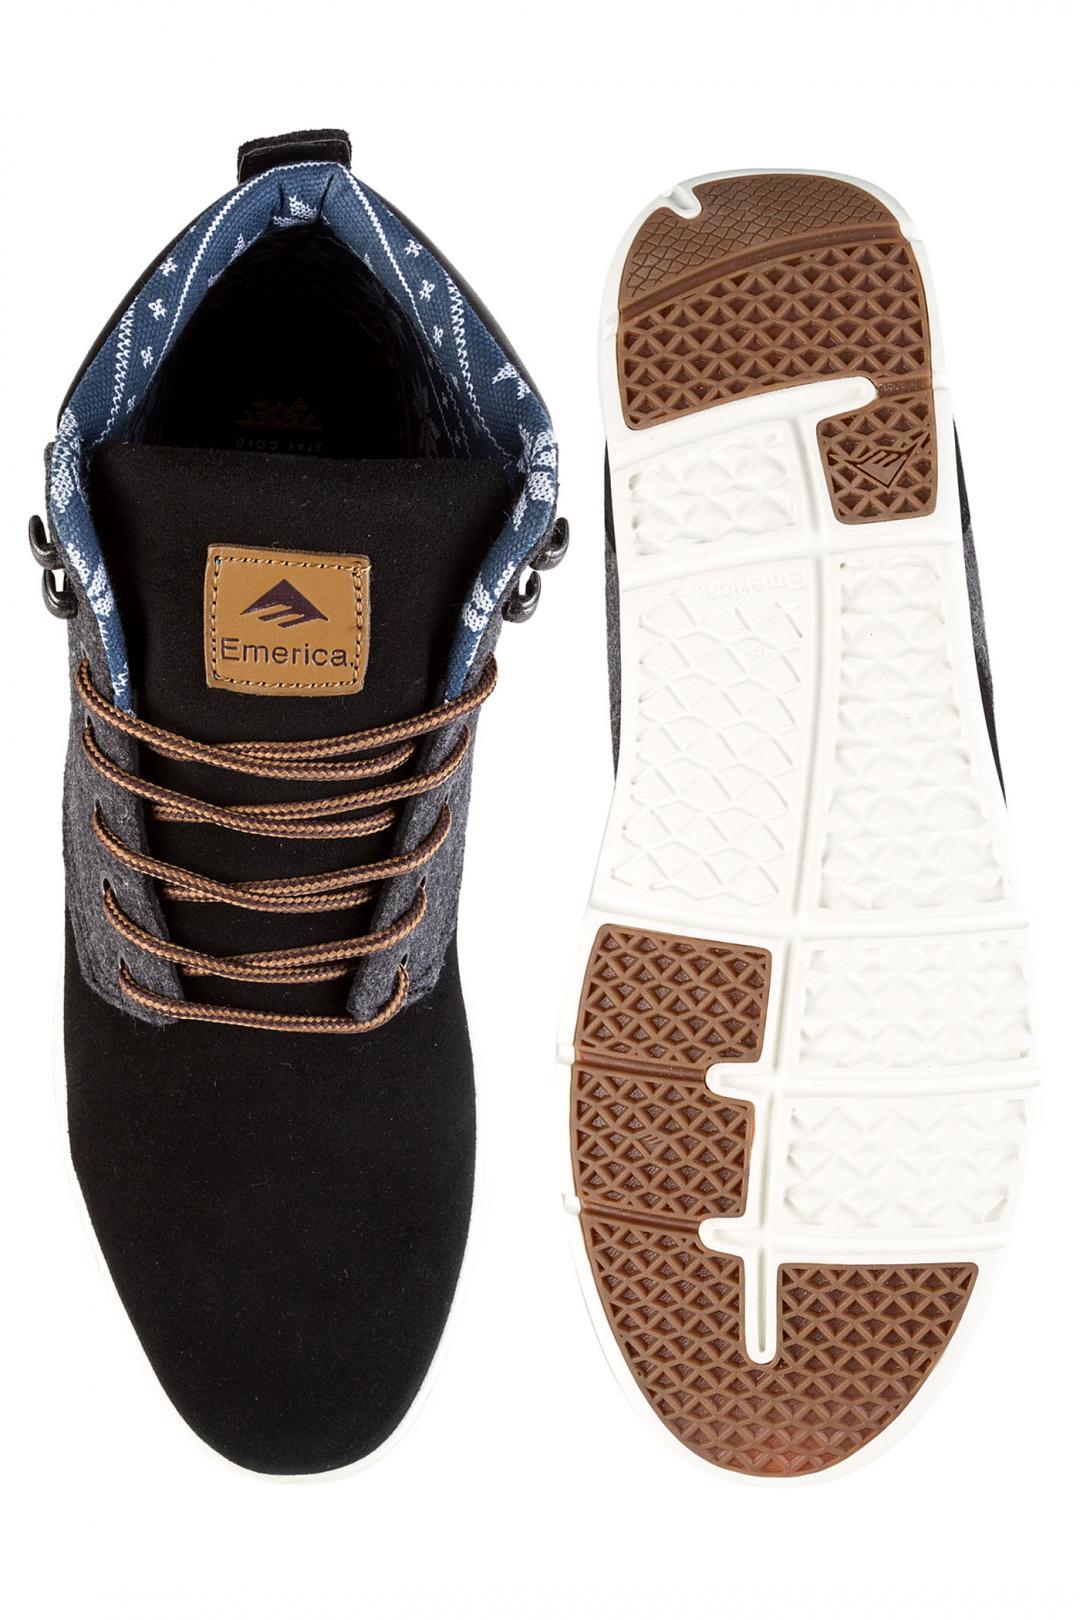 Uomo Emerica Wino Cruiser HLT black white yellow | Sneakers mid top